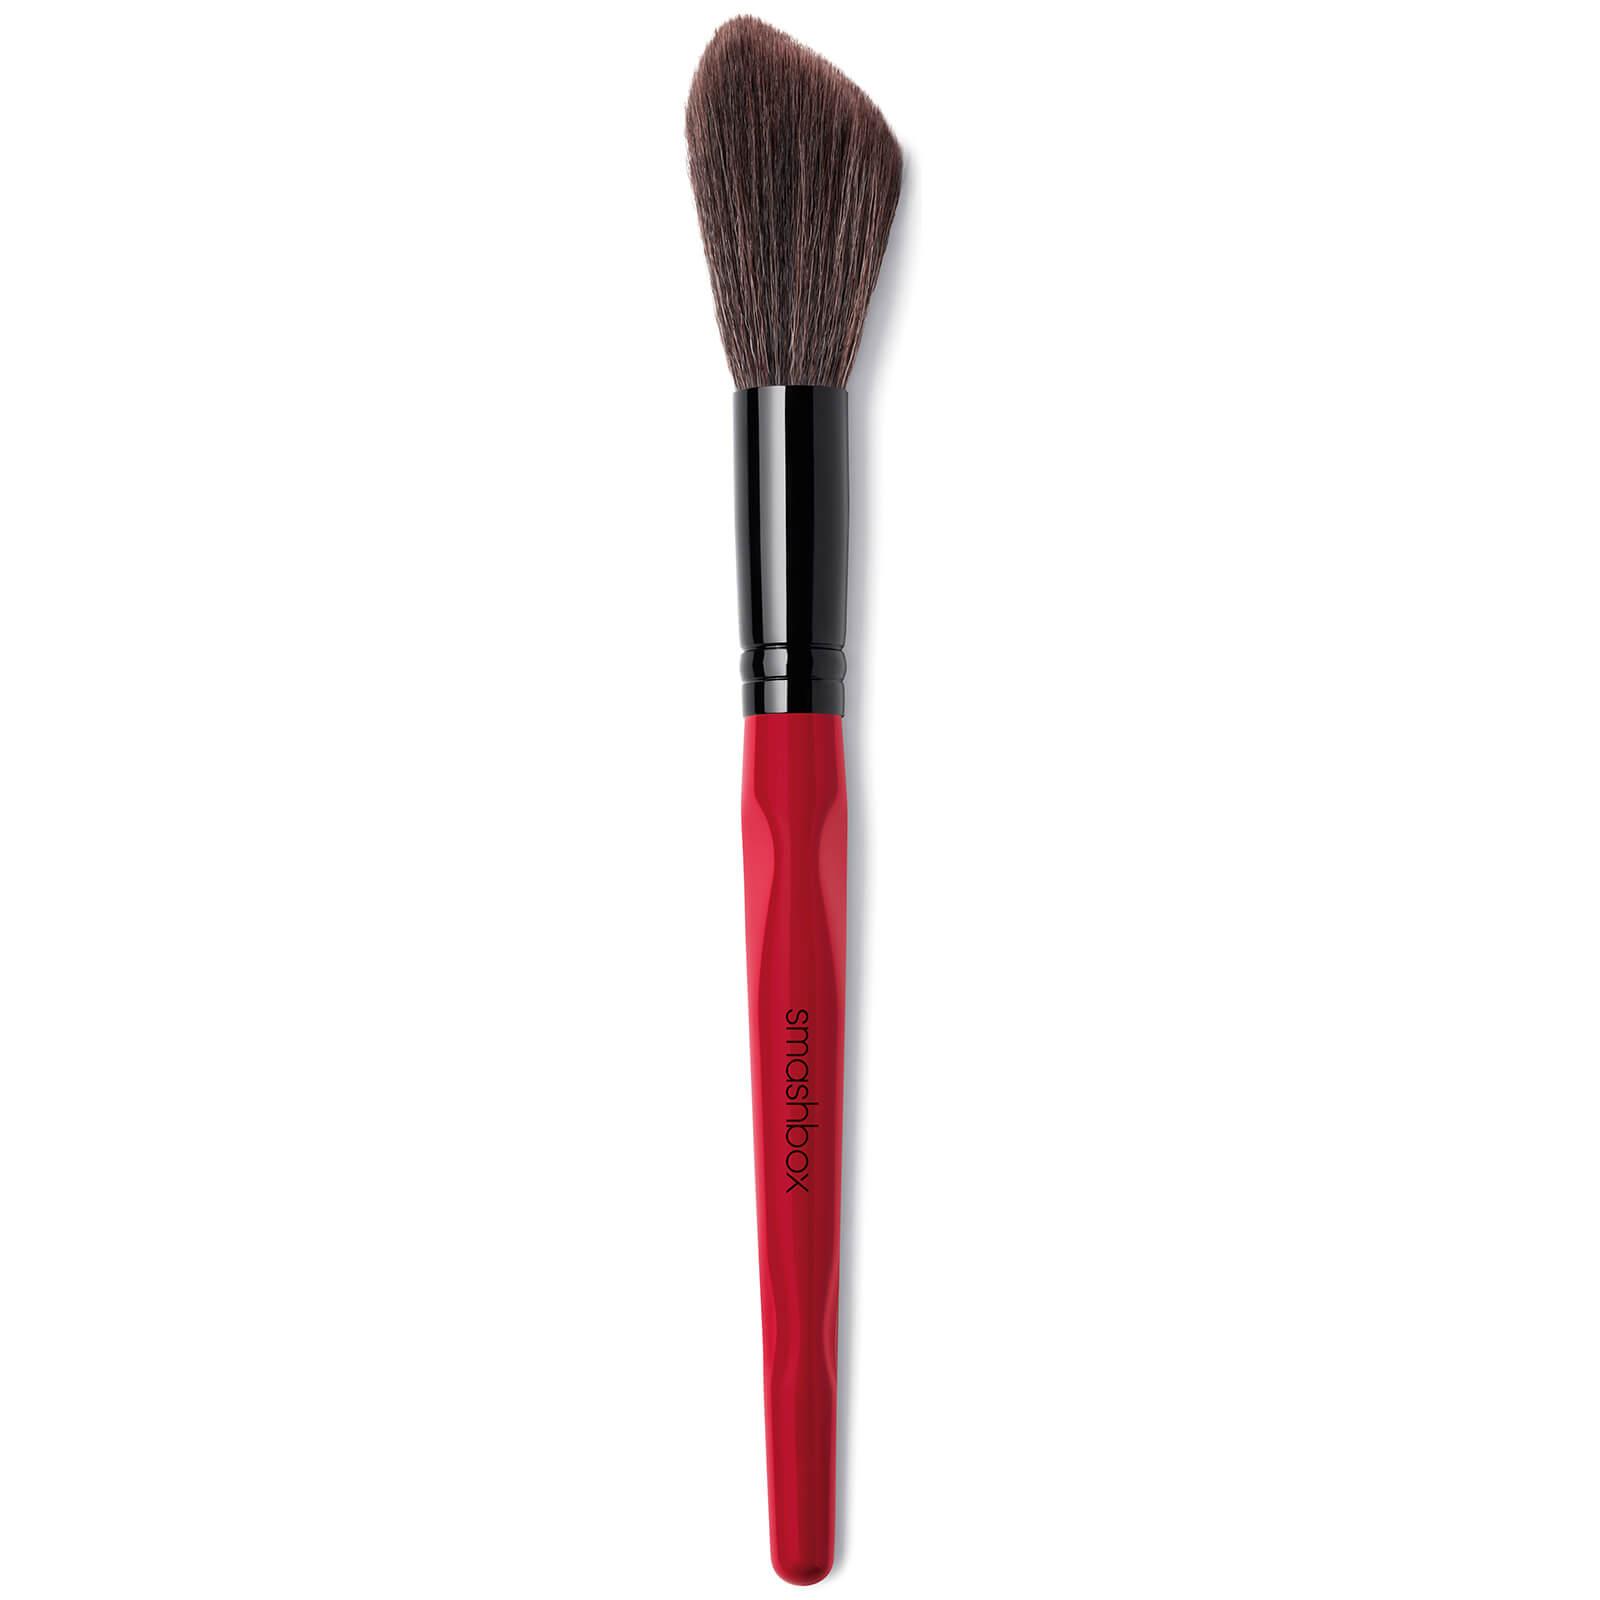 Smashbox Sheer Powder Brush